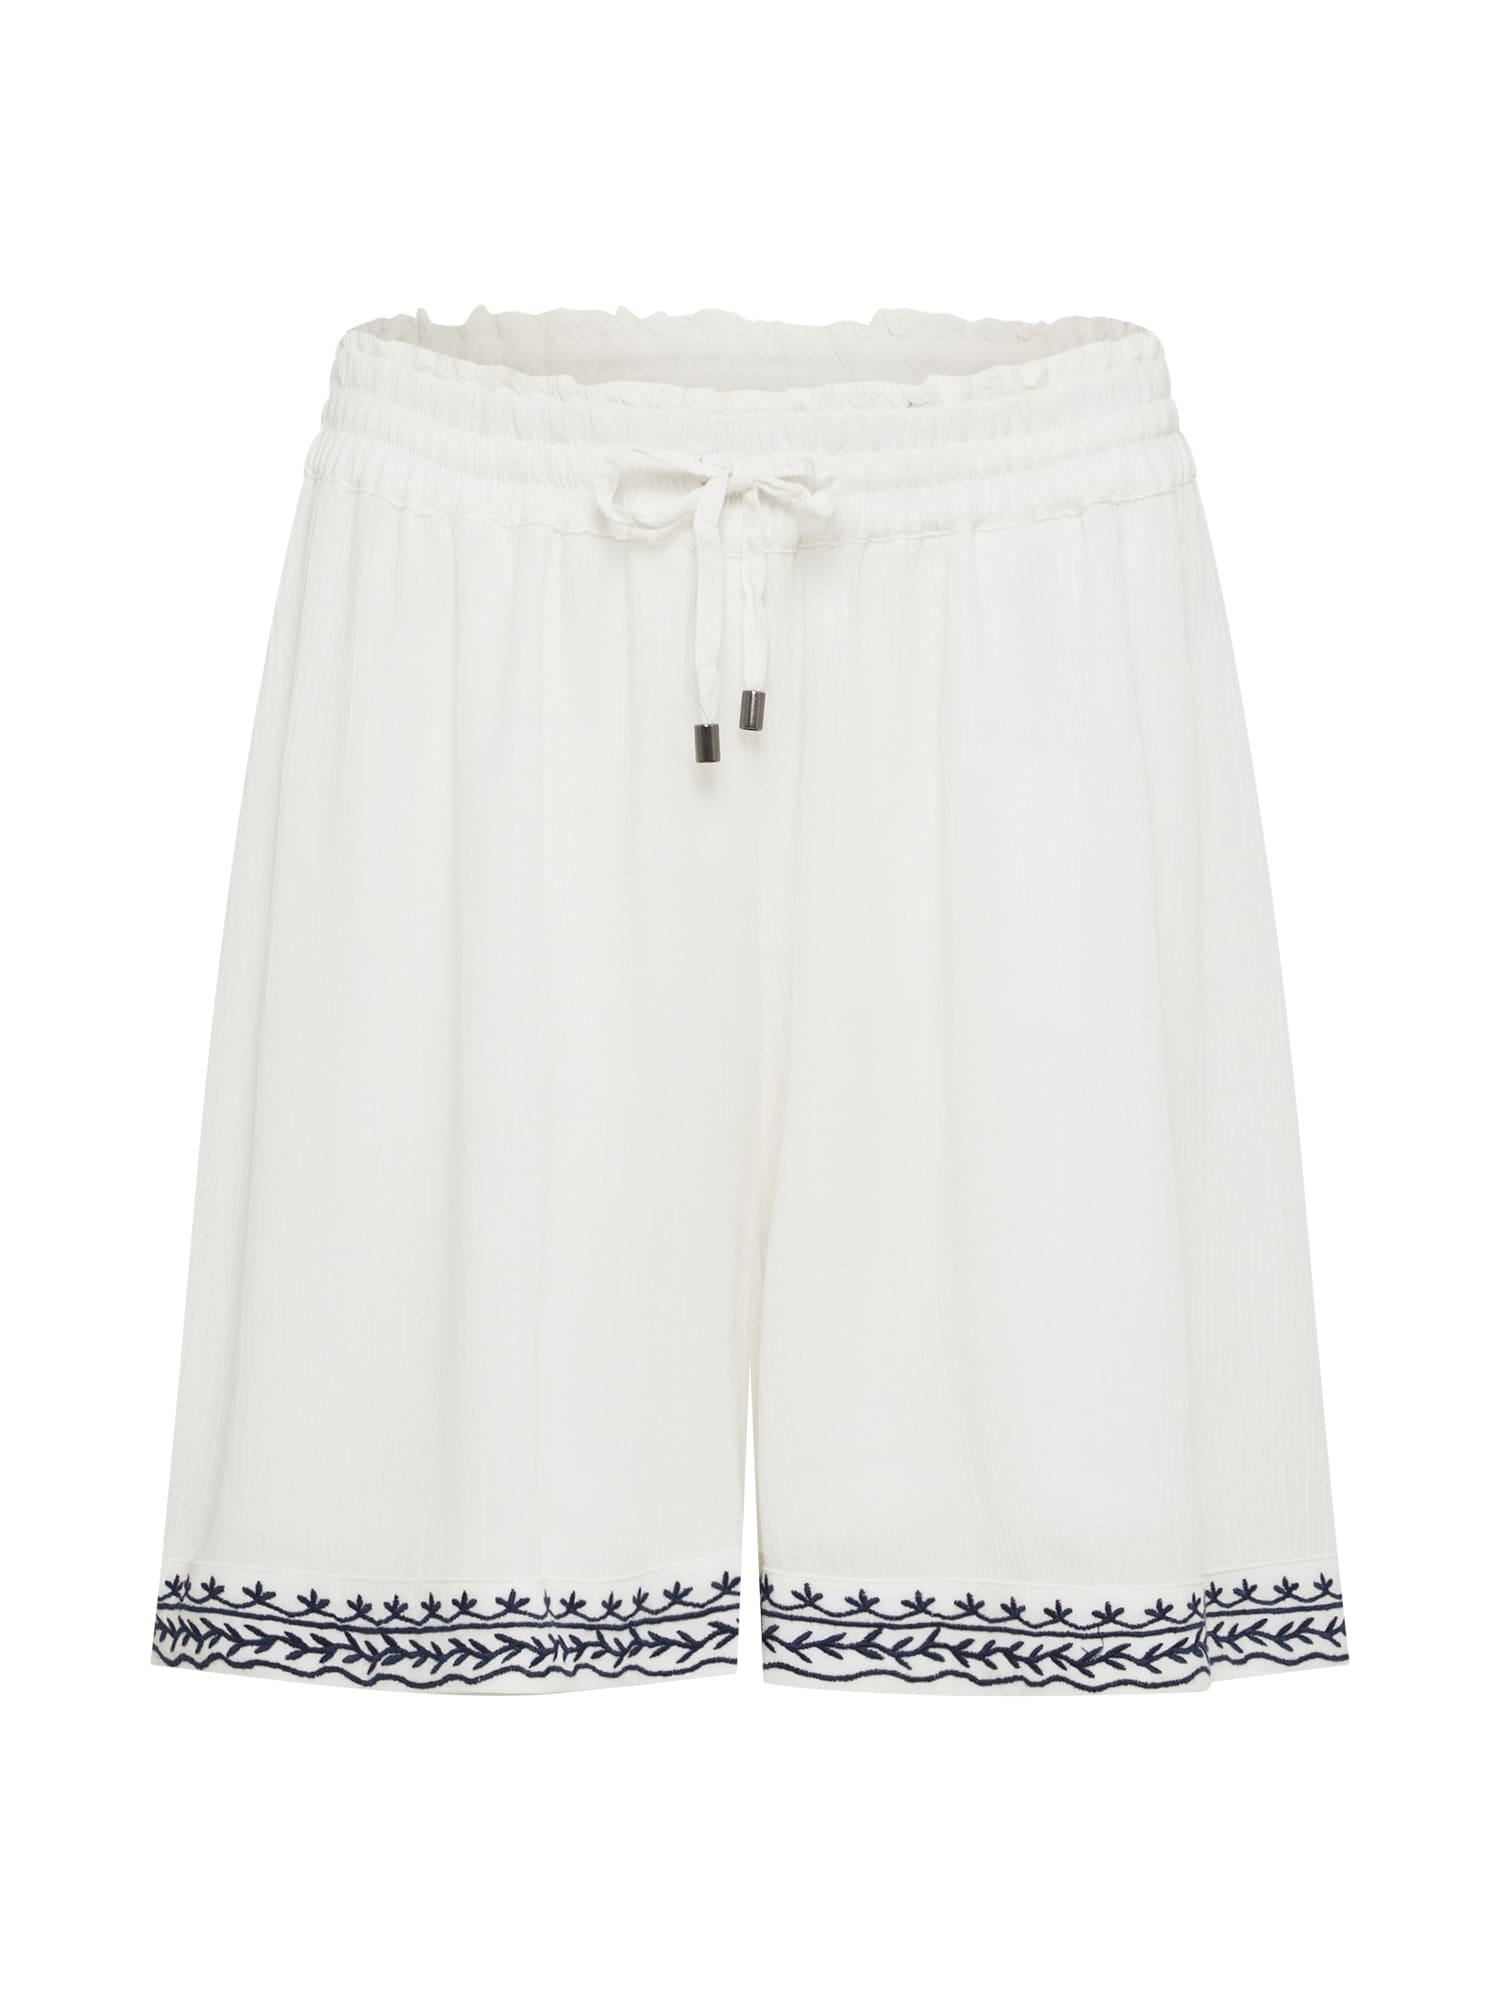 Kalhoty HOUSTON tmavě modrá bílá VERO MODA